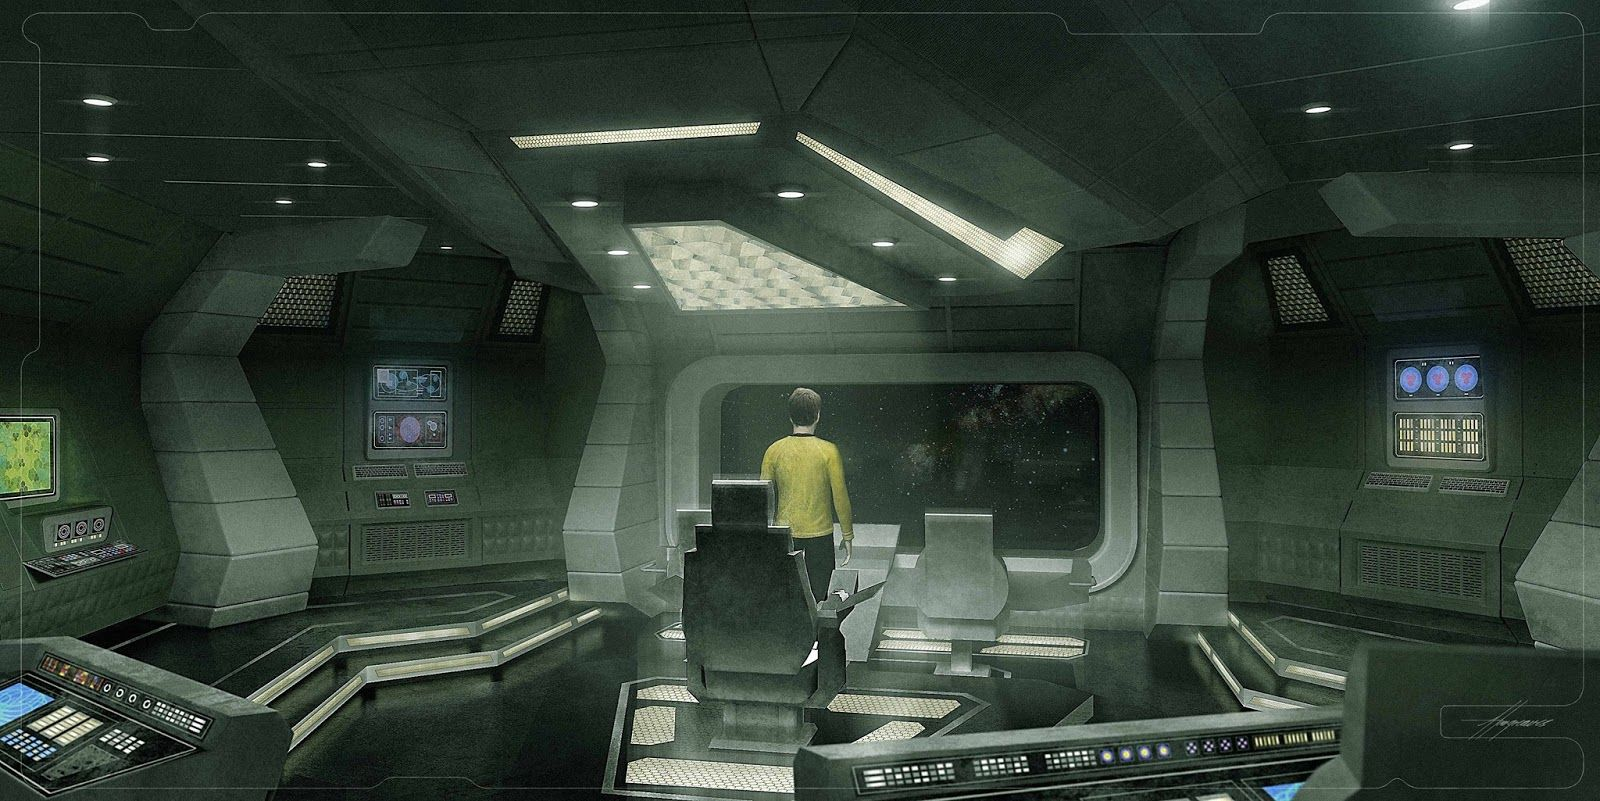 Sean+Hargreaves+Star+Trek+Beyond+USS+Franklin+bridge ...